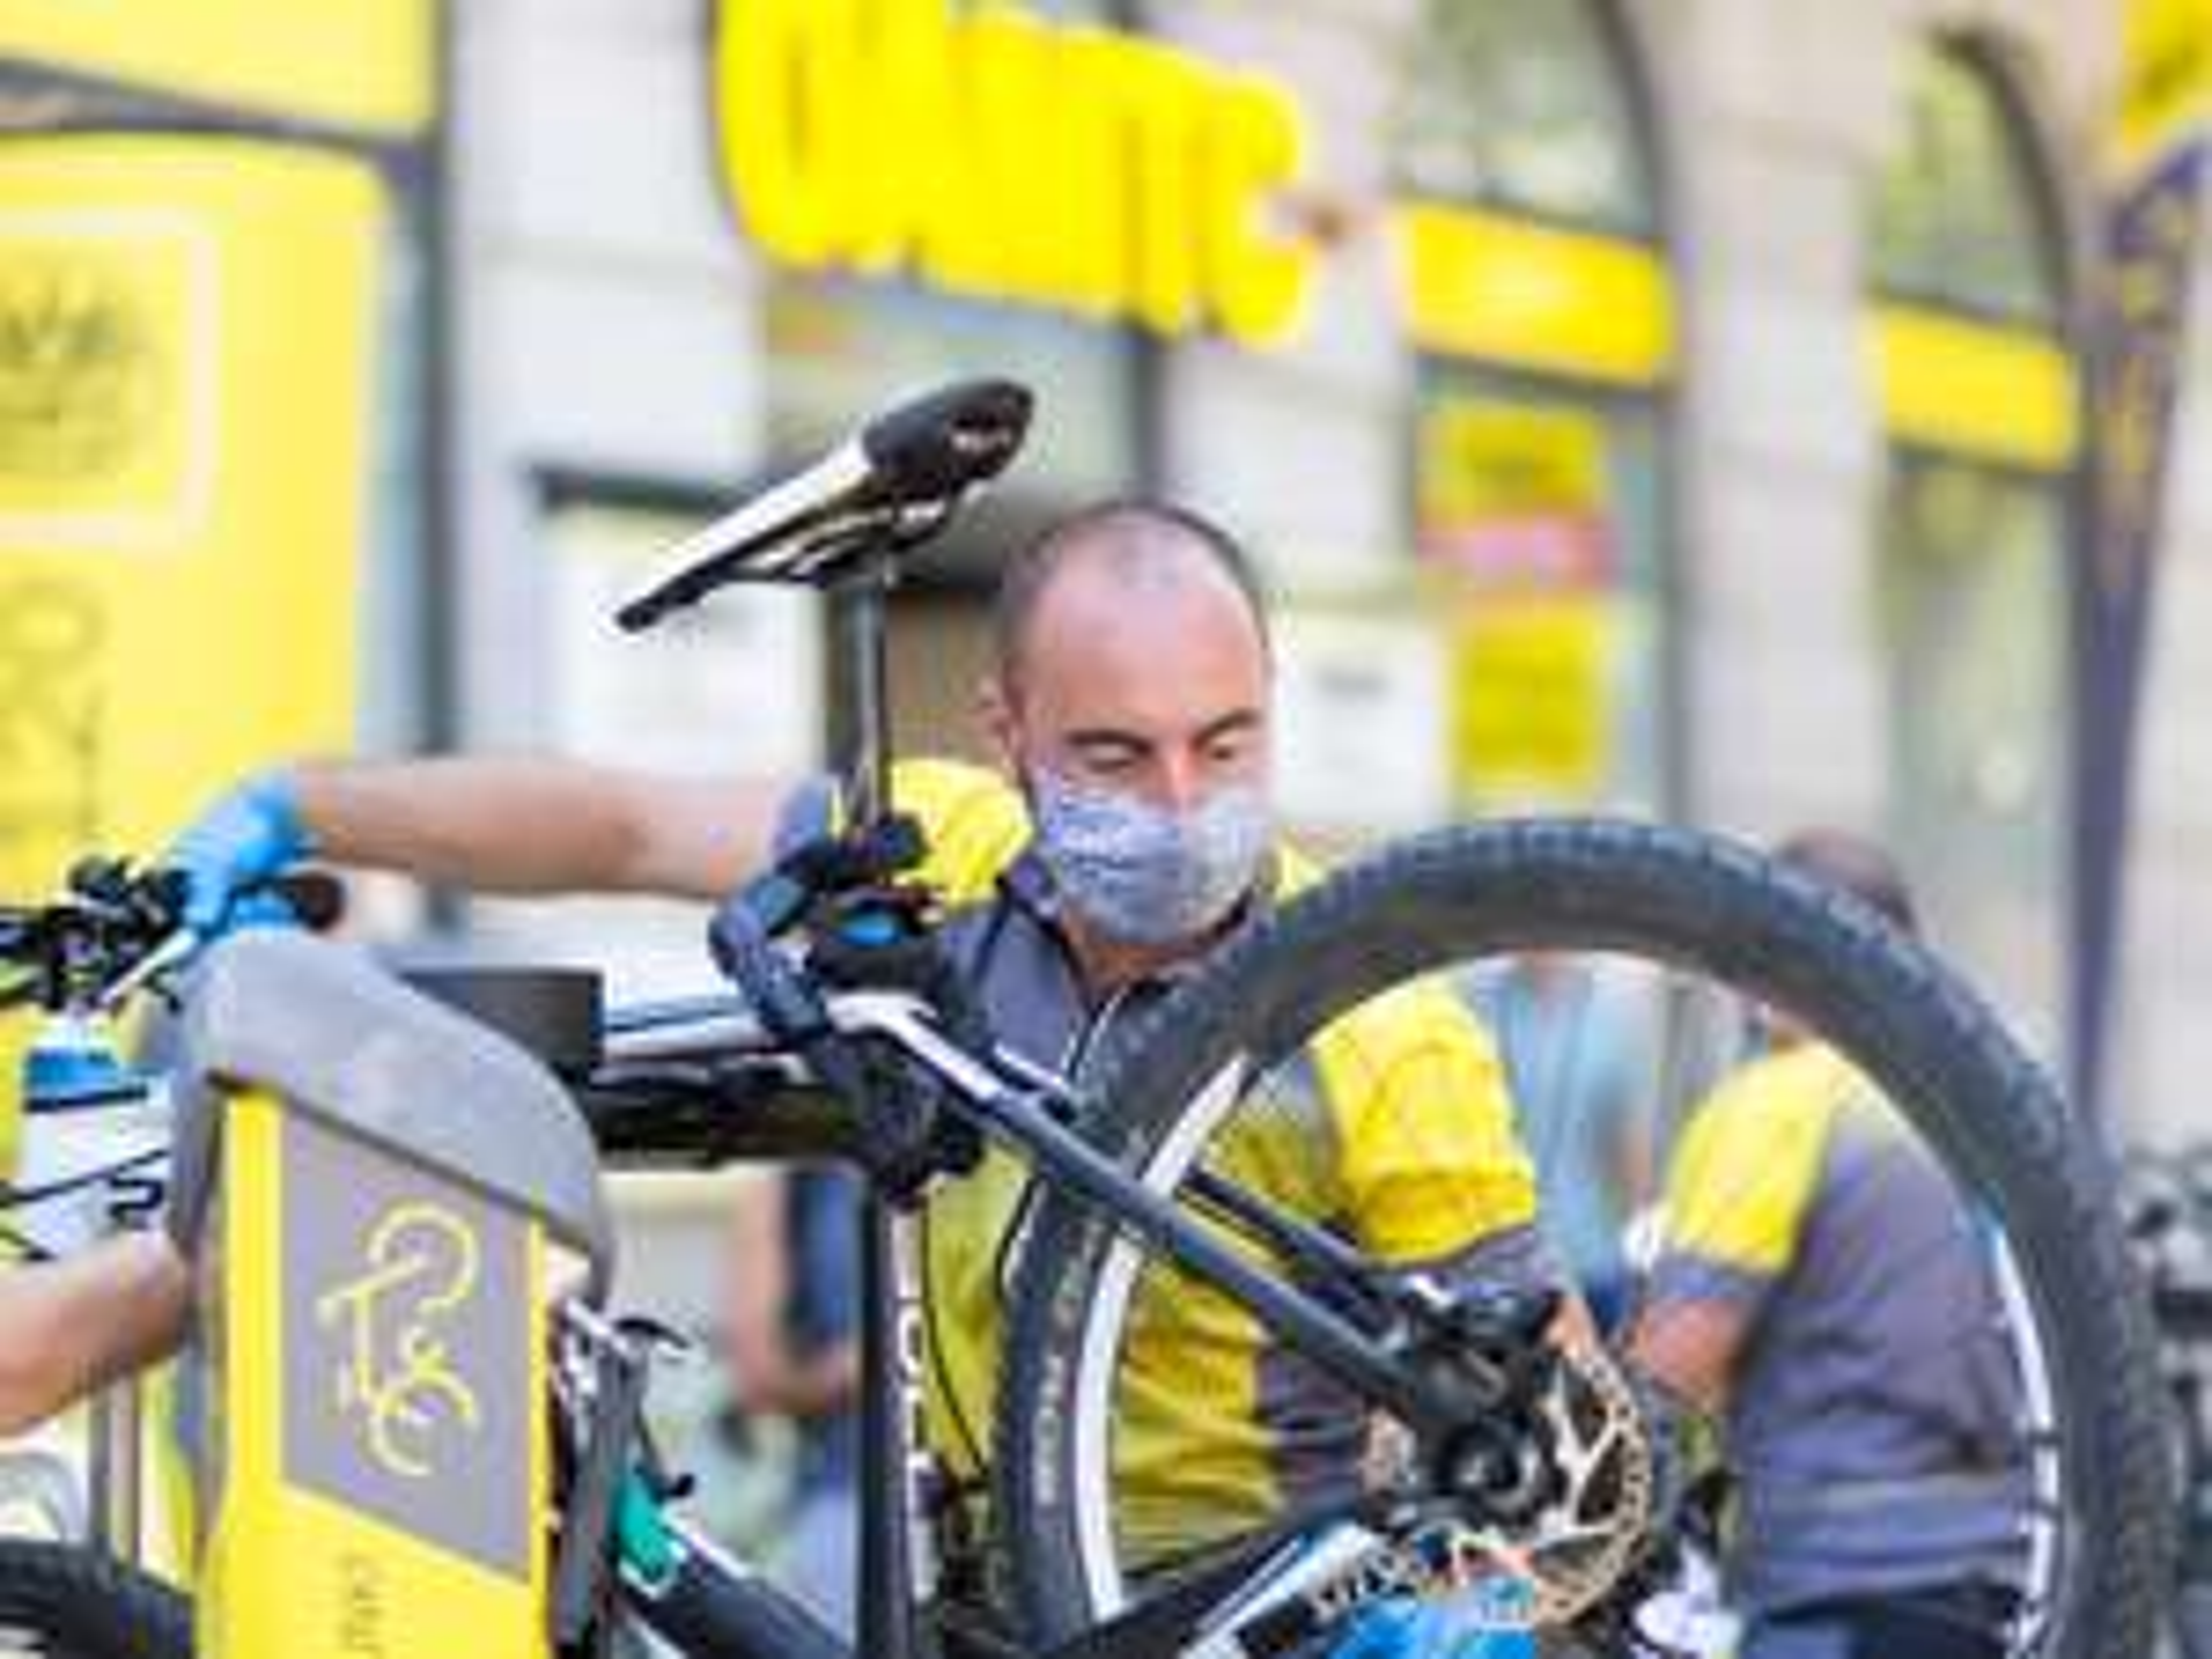 (Wien) GRATIS ÖAMTC Fahrrad Check - 8.8.+21.8.2020